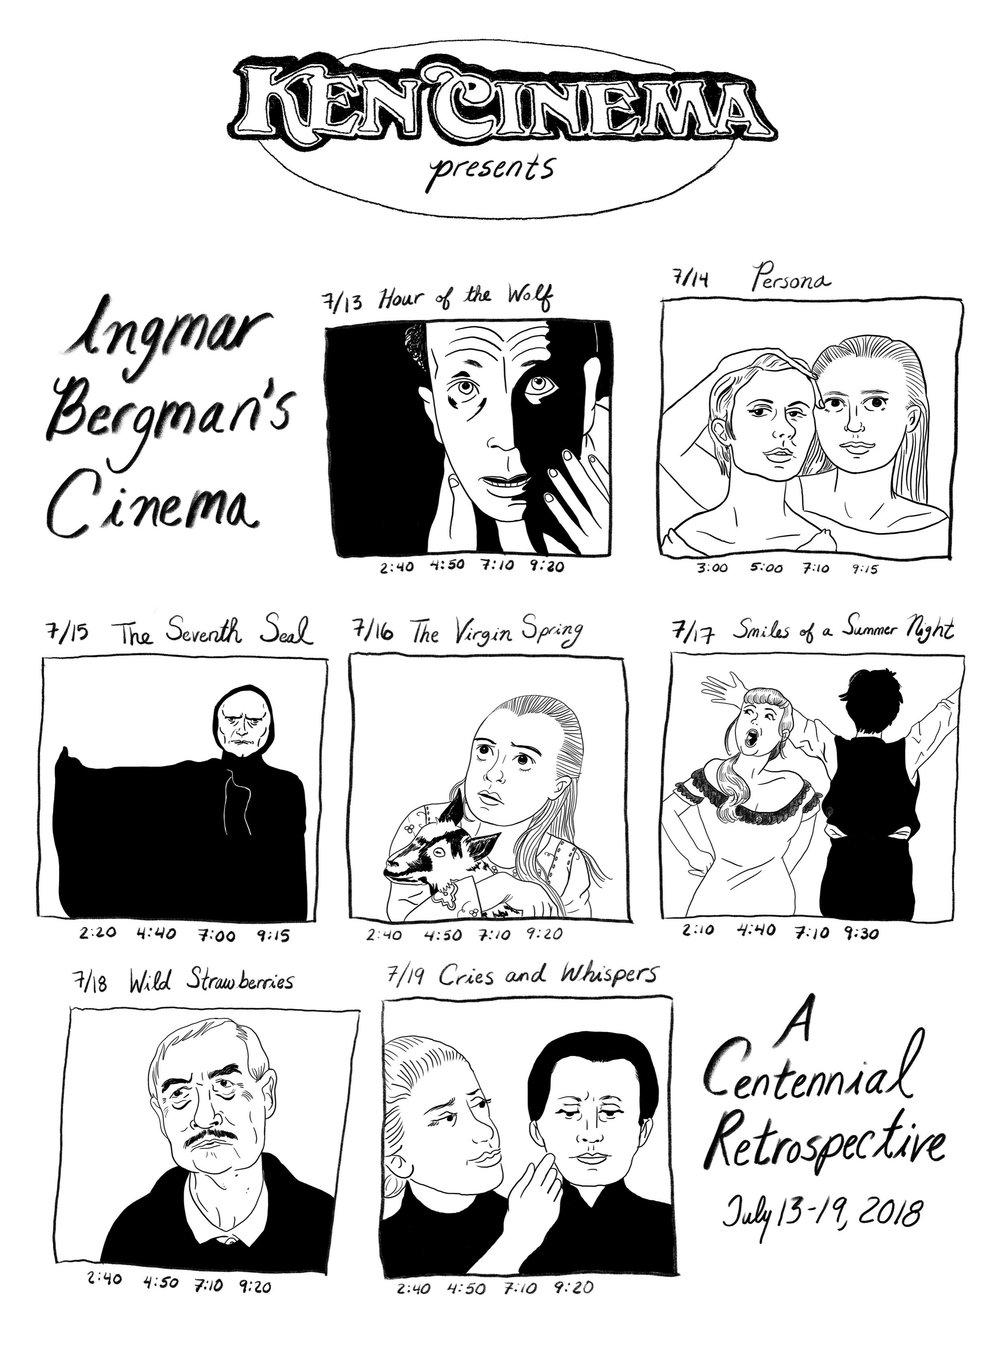 Landmark's Ken Cinema's Ingmar Bergman Centennial Retrospective poster (2018)